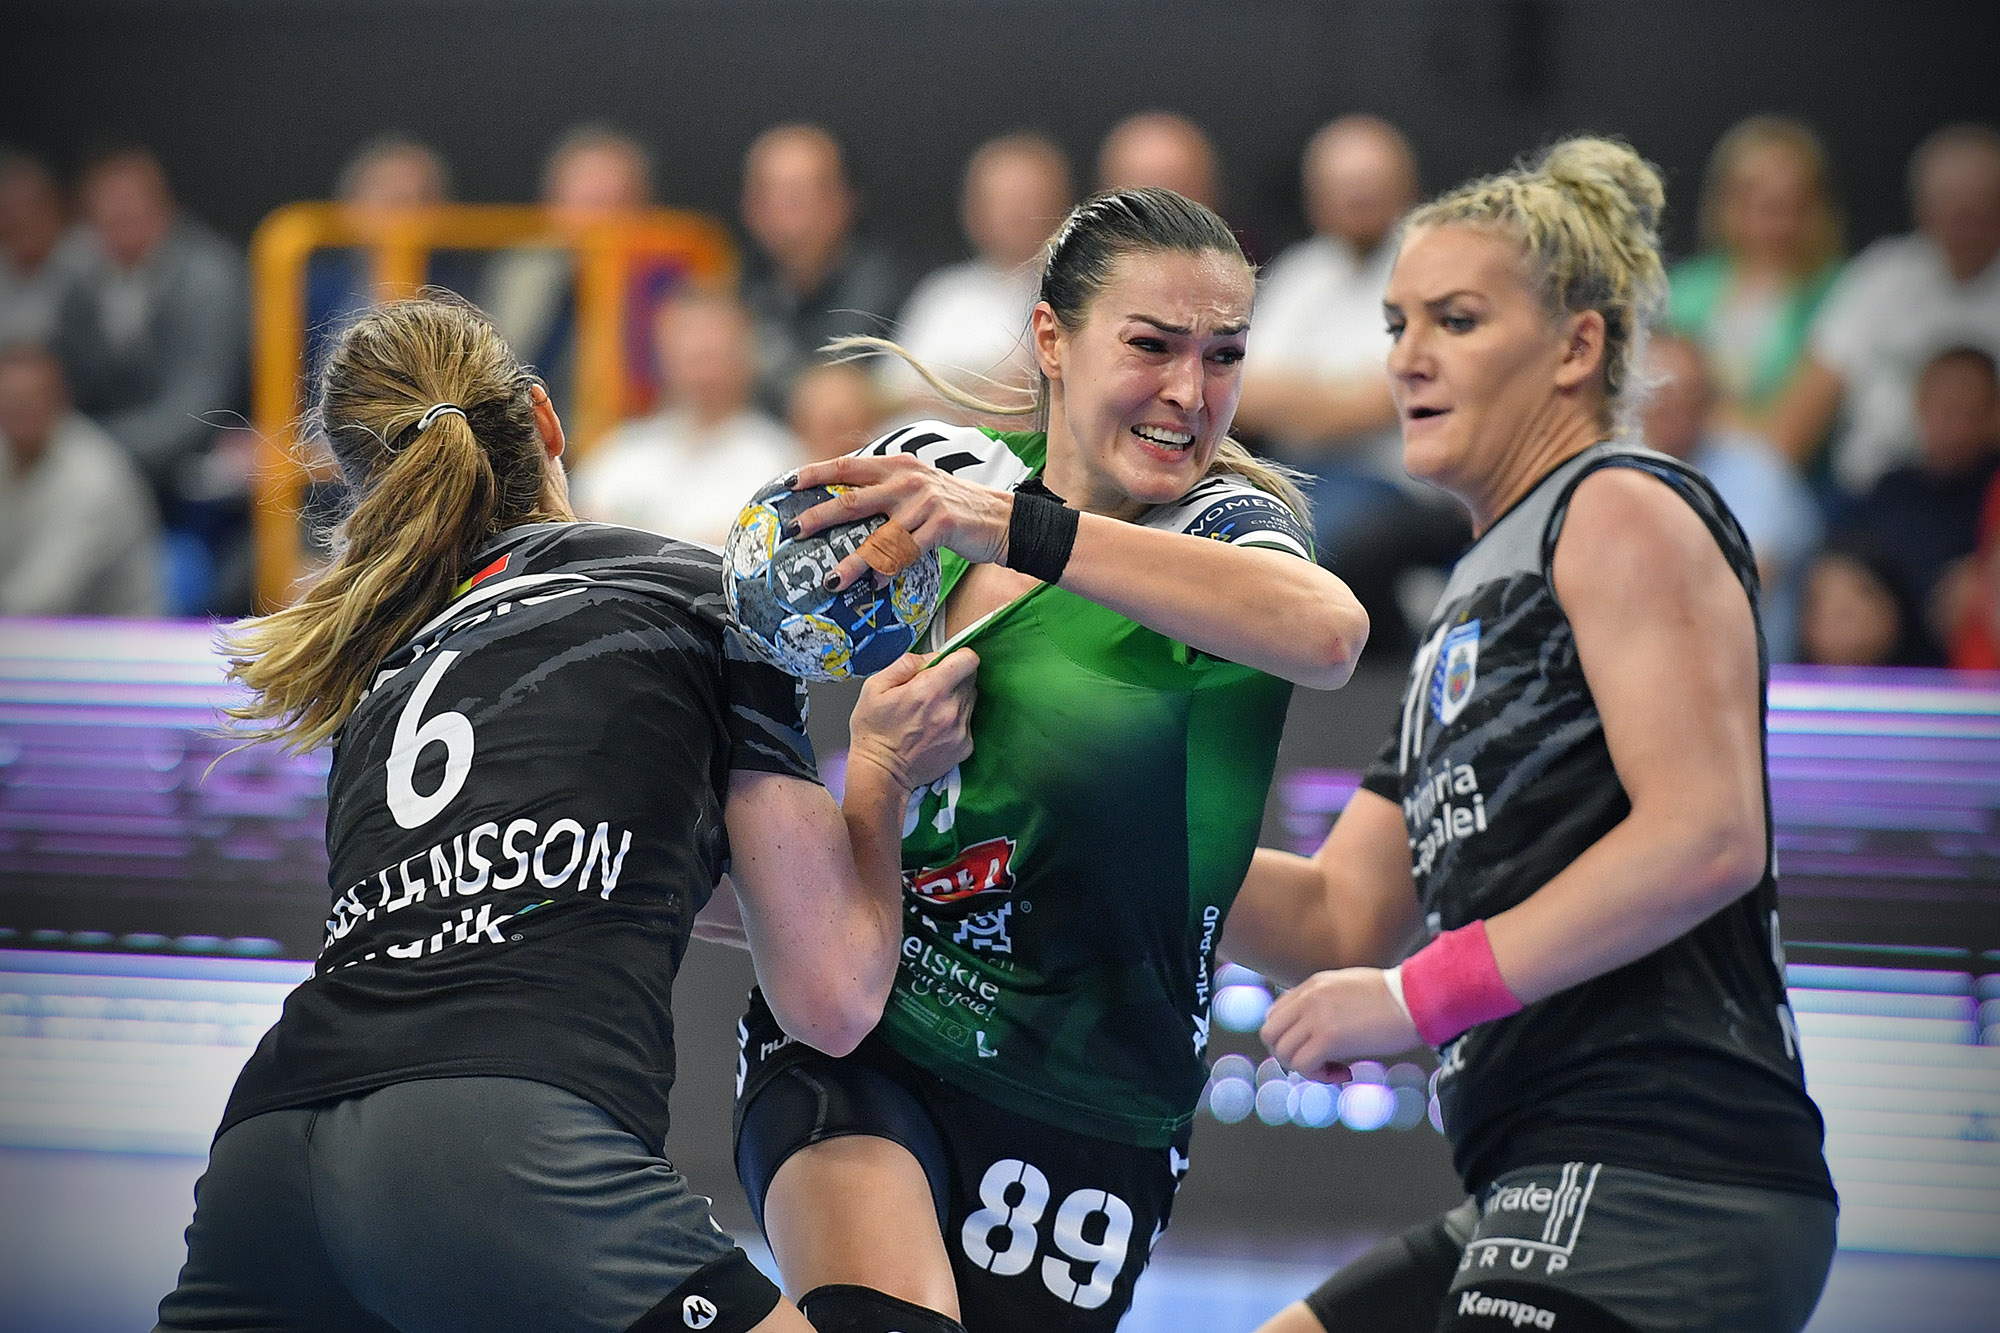 EHF Champions League: MKS Perła Lublin - CSM Bukareszt 19:28 (10:17).